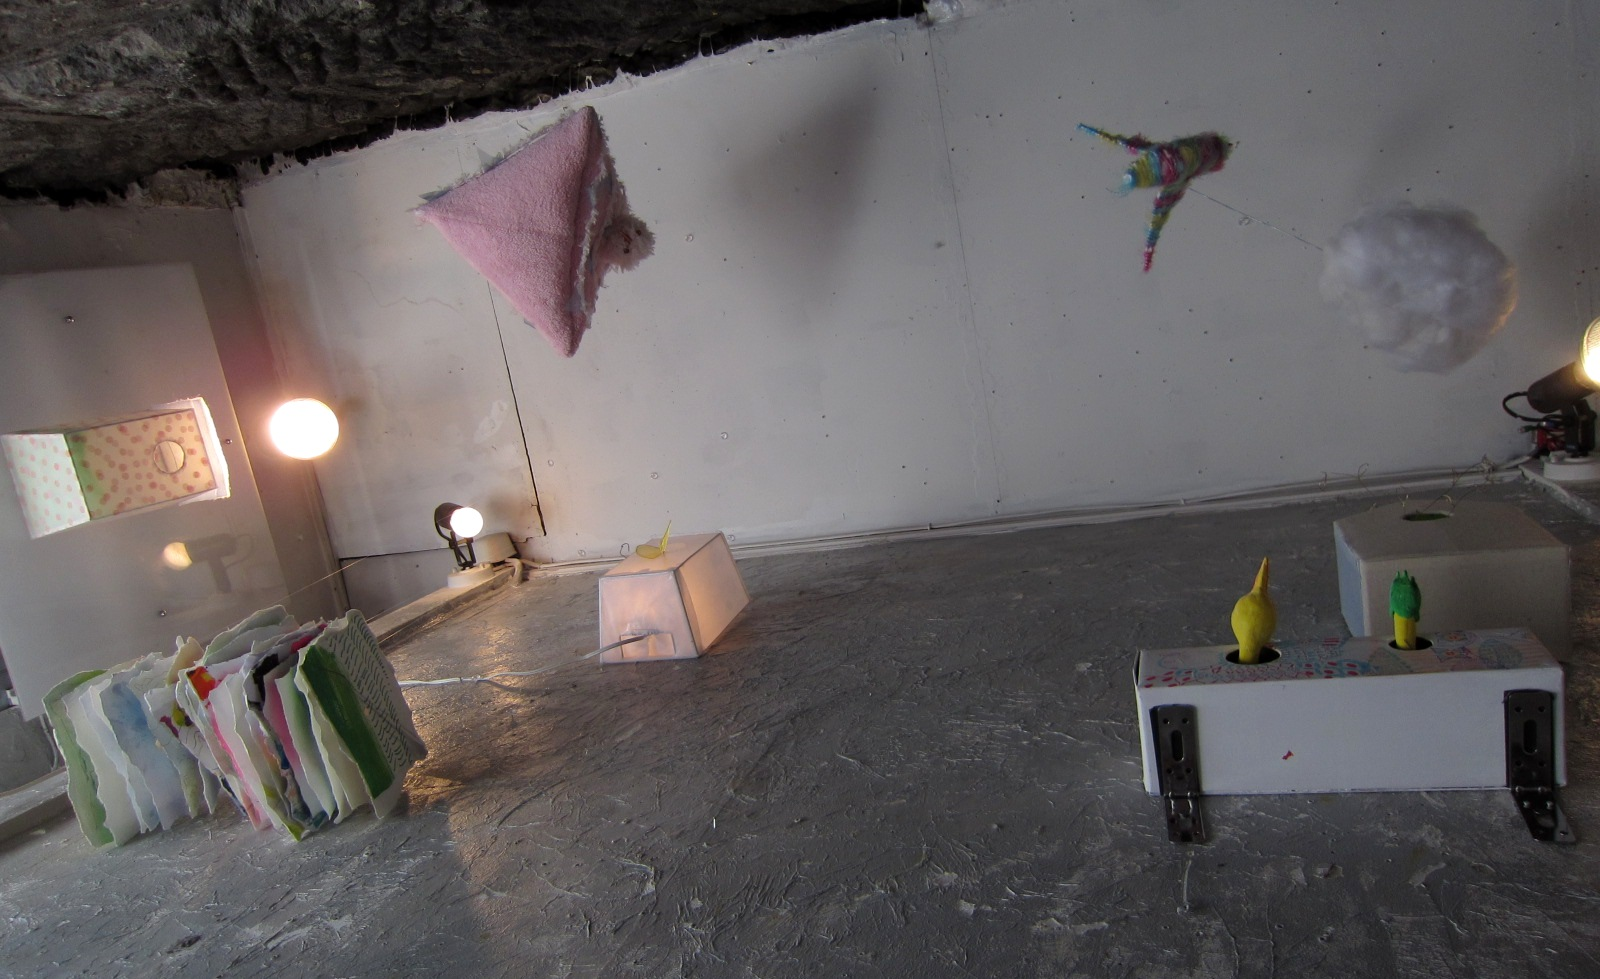 2020) 「jobin. とpaterの二人展 『ハルナデ展2013』」 ニュー・スター 4月15 日(月)~4月29日(日)  _f0126829_1294340.jpg